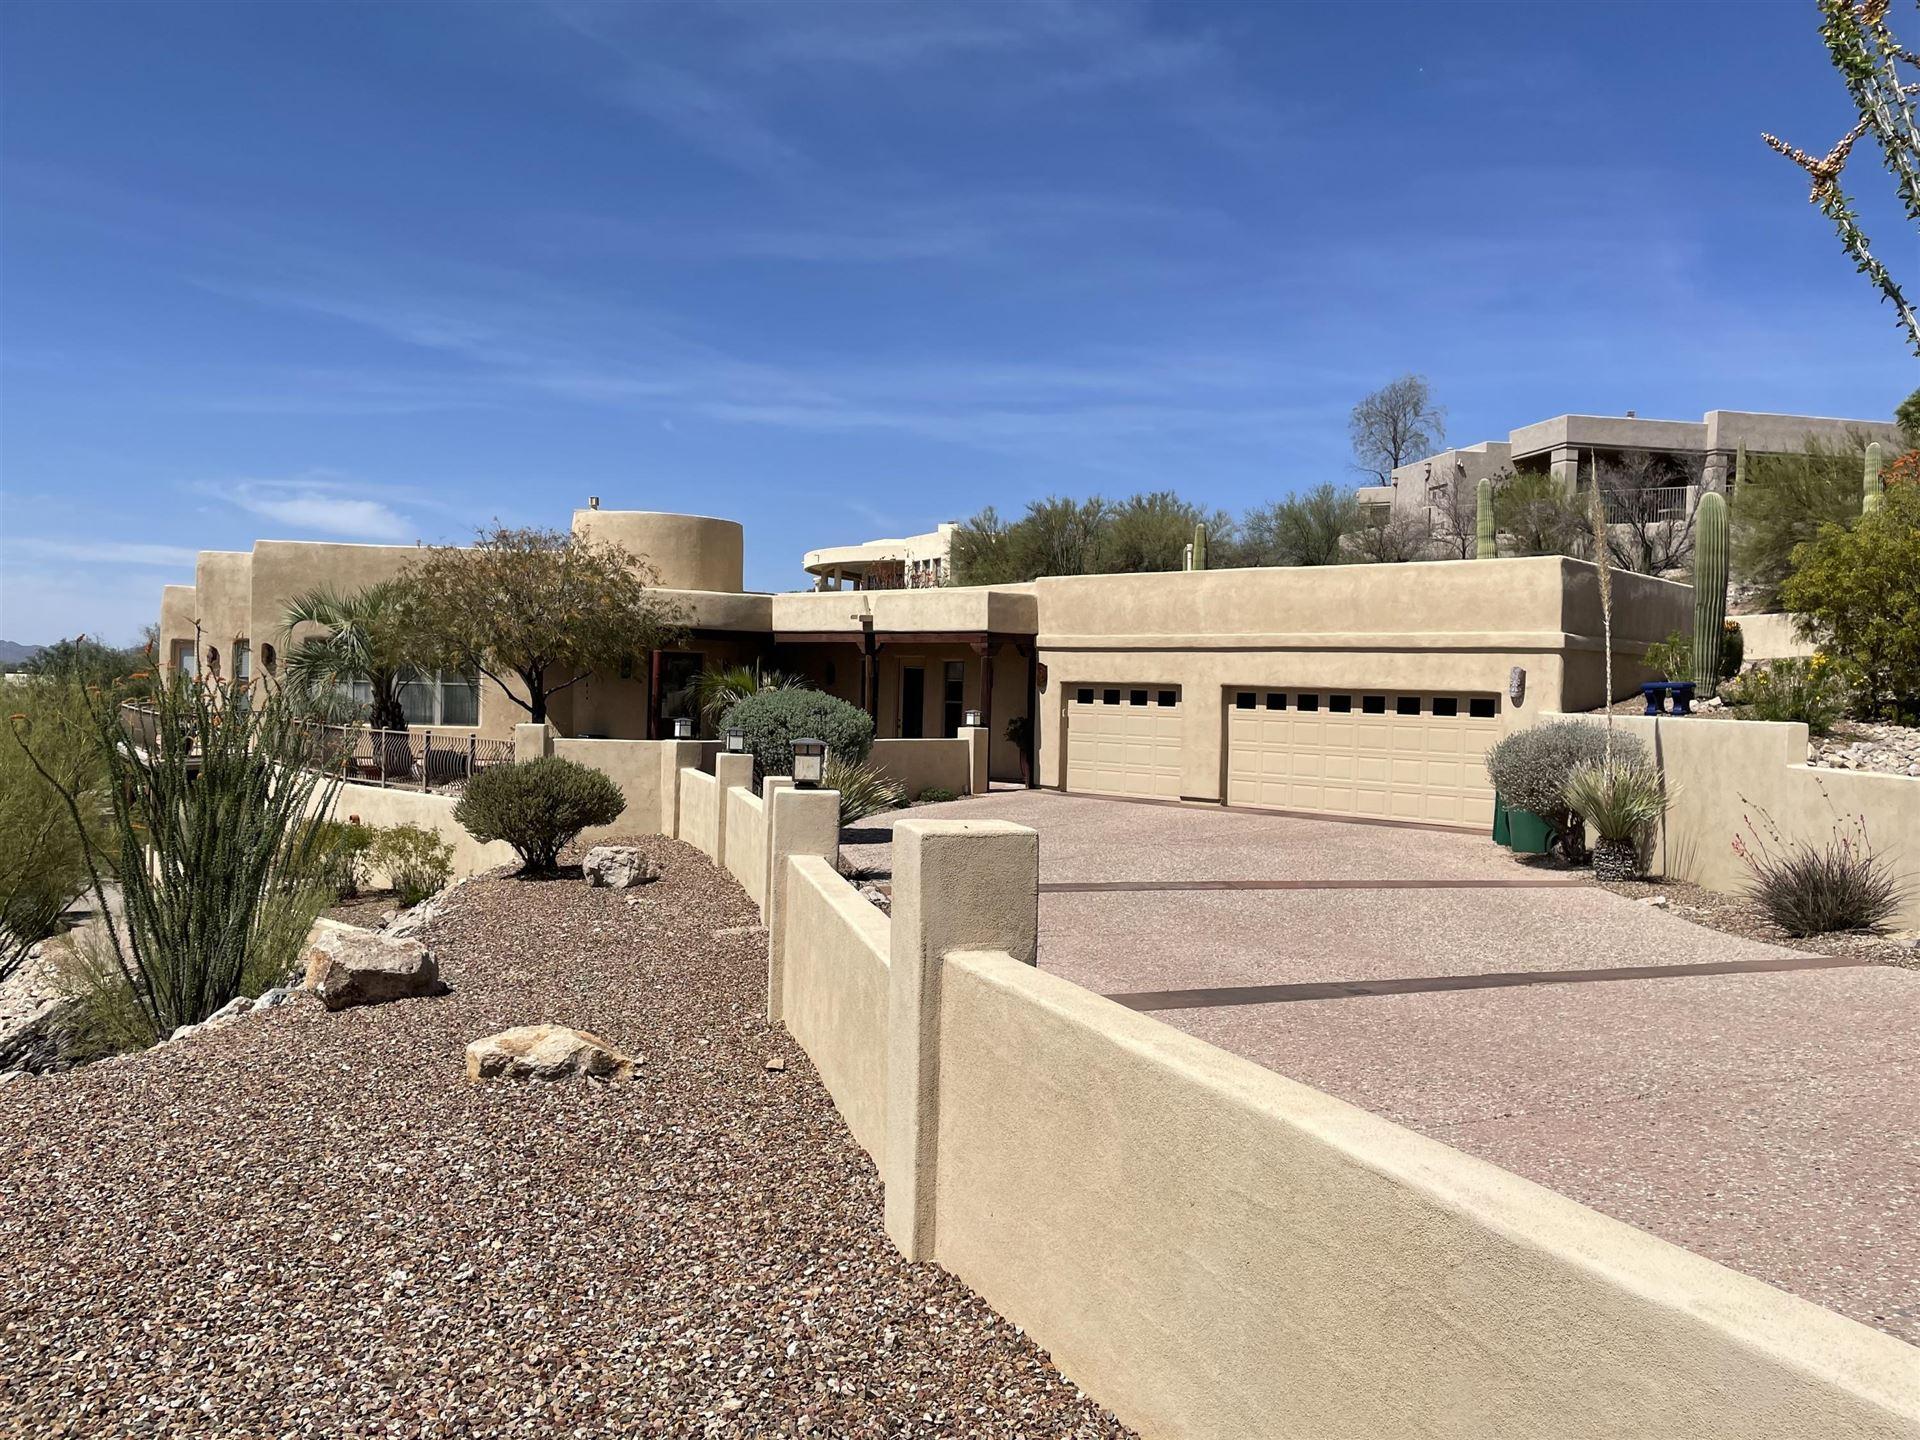 3592 E Camino De Jaime, Tucson, AZ 85718 - MLS#: 22110021